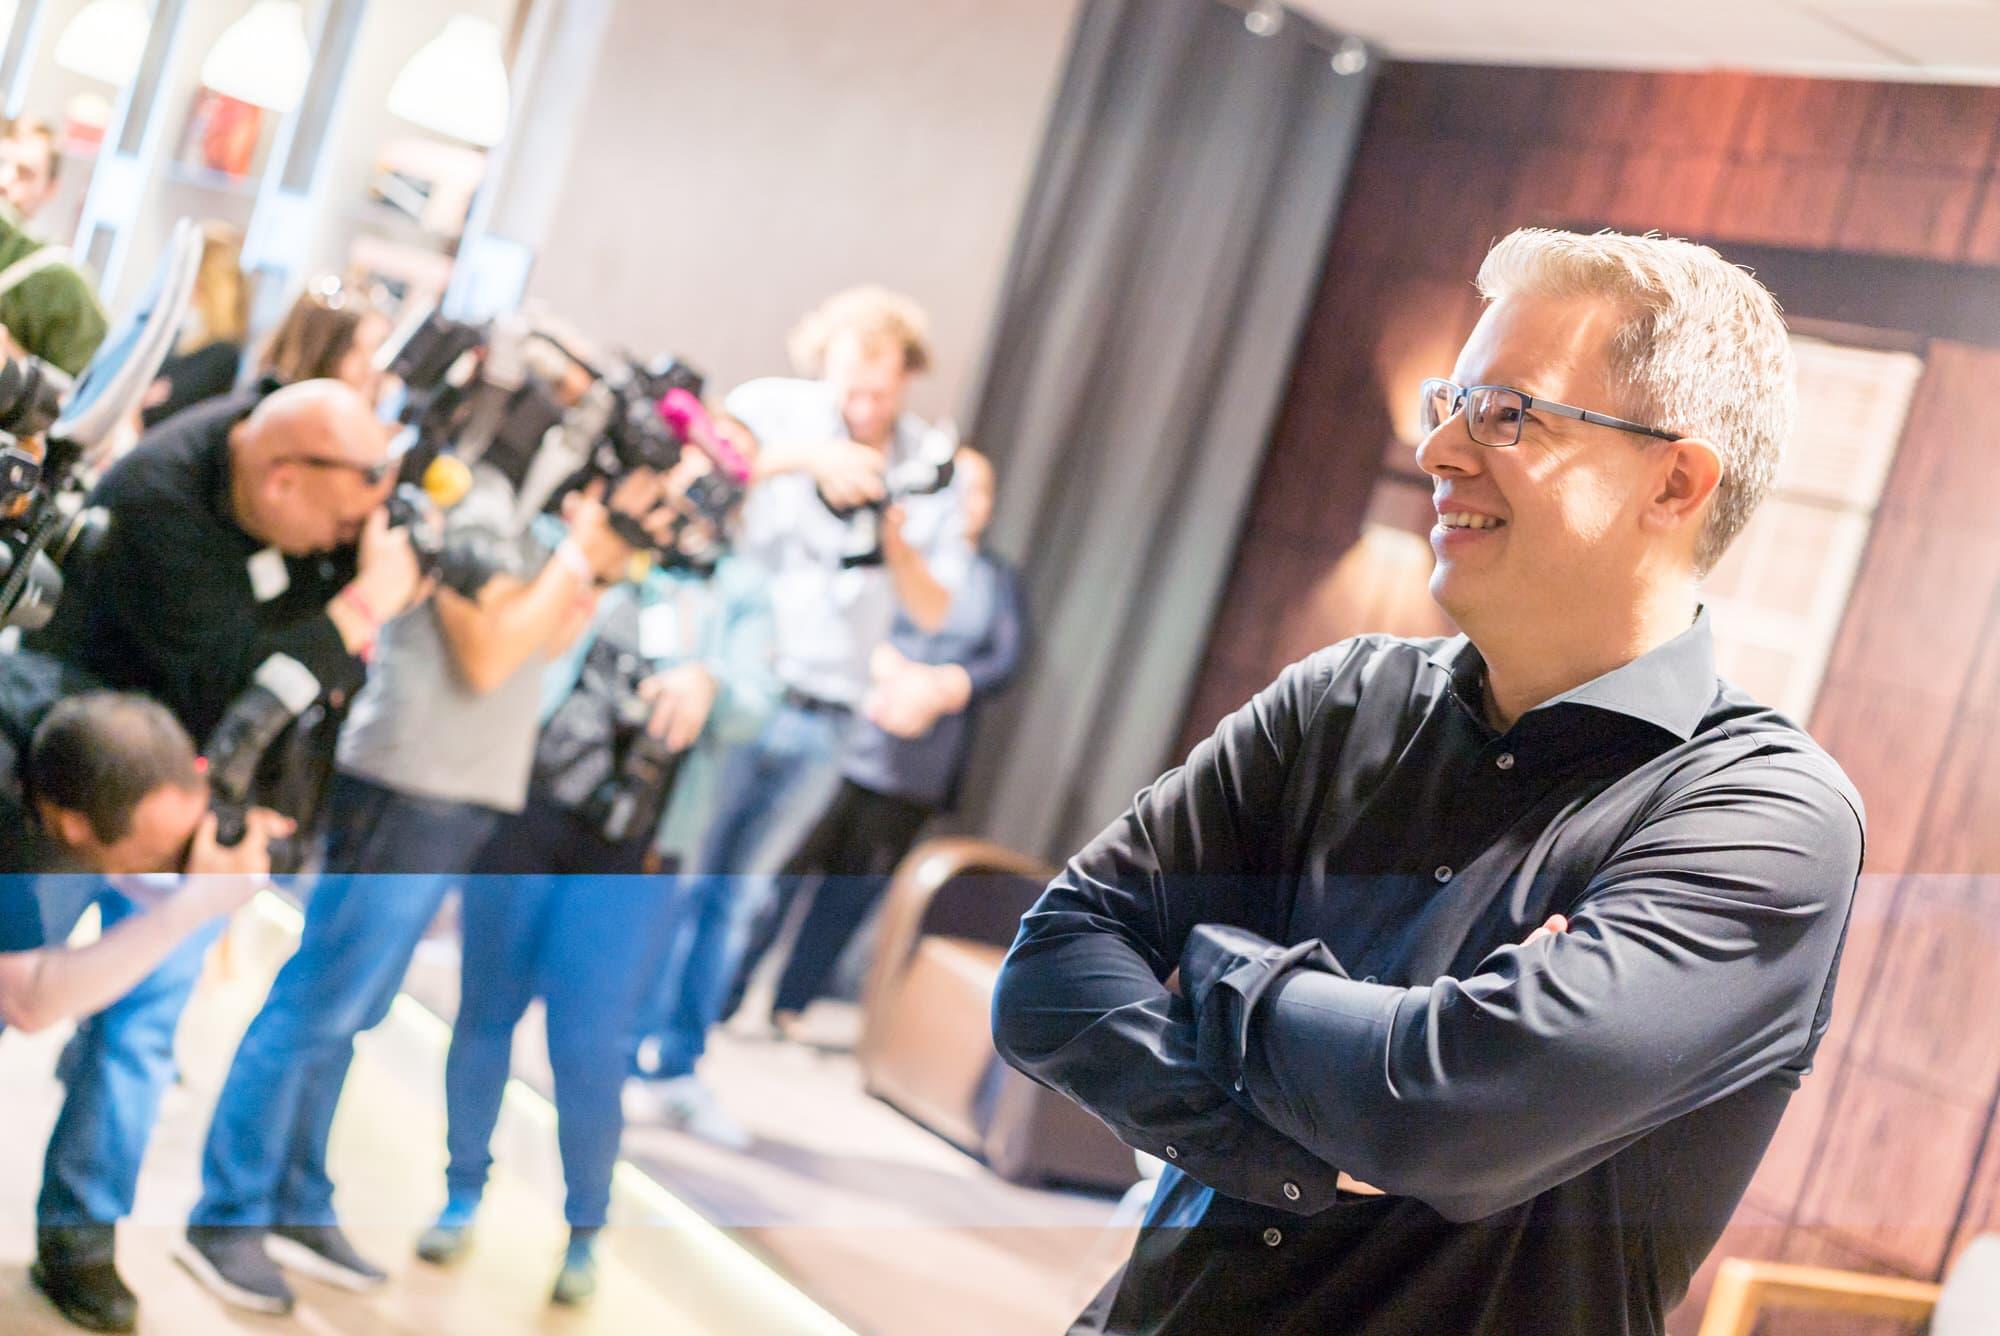 Fotograf Frankfurt Eventfotografie Pressekonferenz Höhle der Löwen